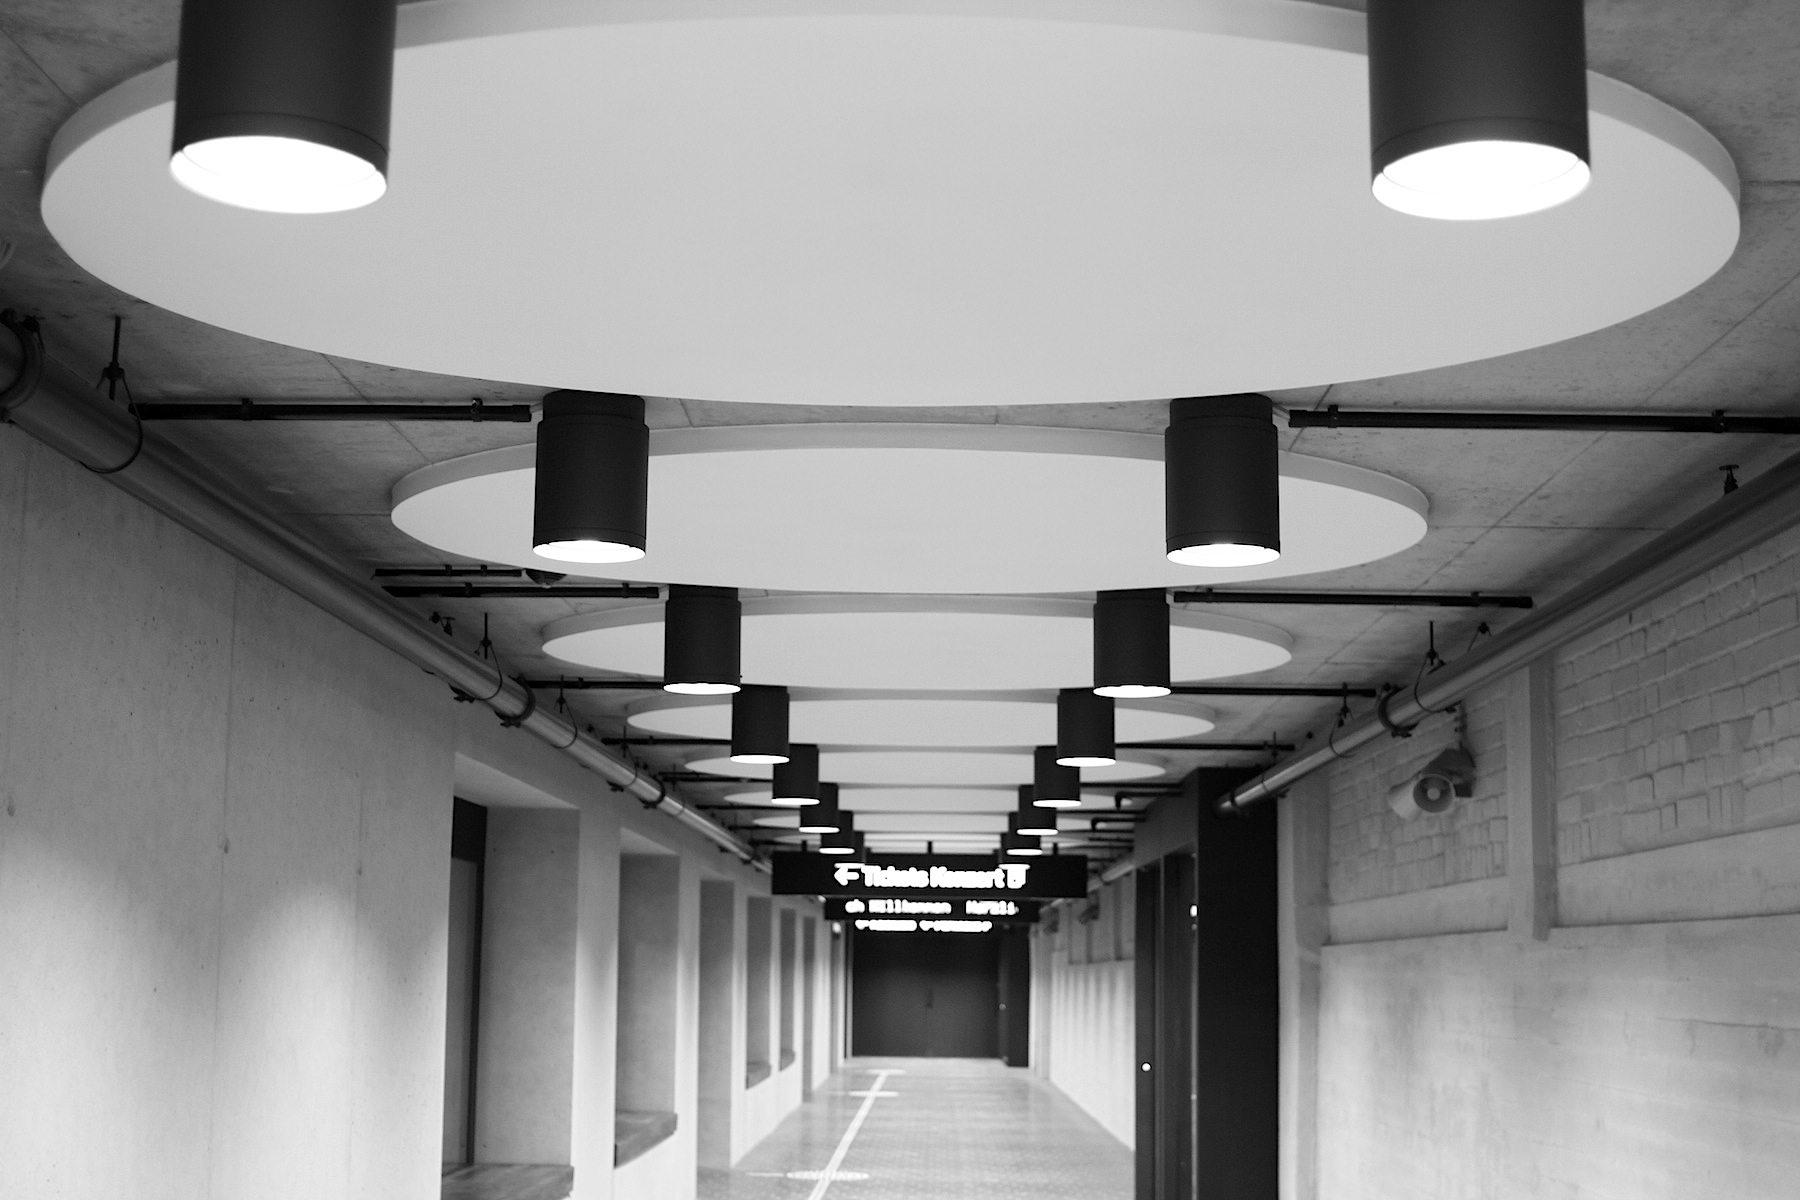 Symmetrie. Korridor zum Ausgang und Parkhaus.